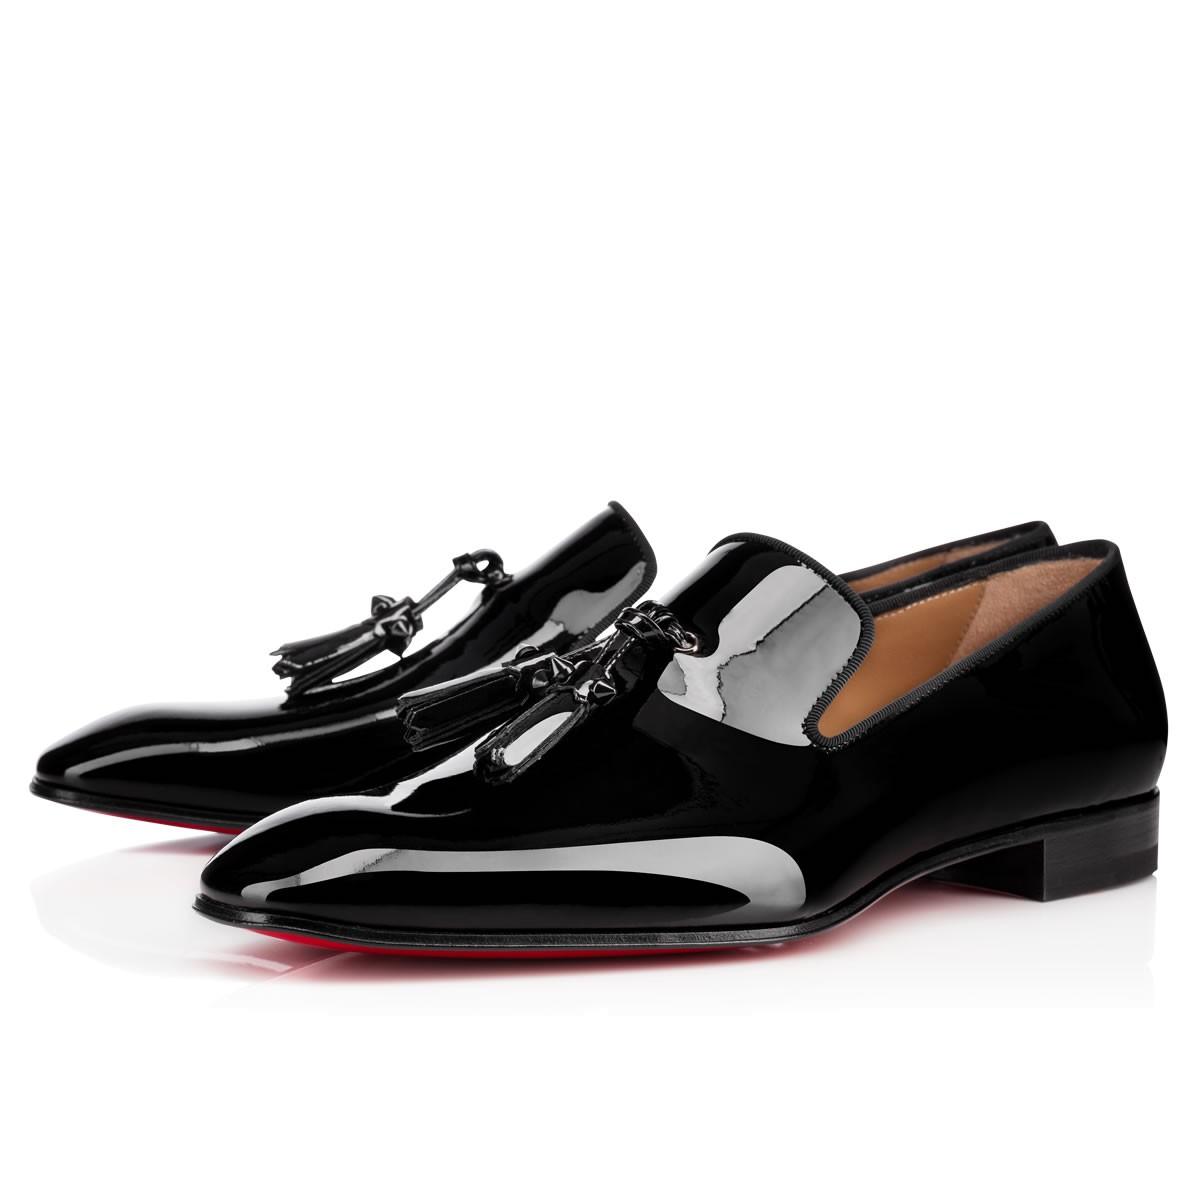 Men Shoes - Dandelion Tassel - Christian Louboutin